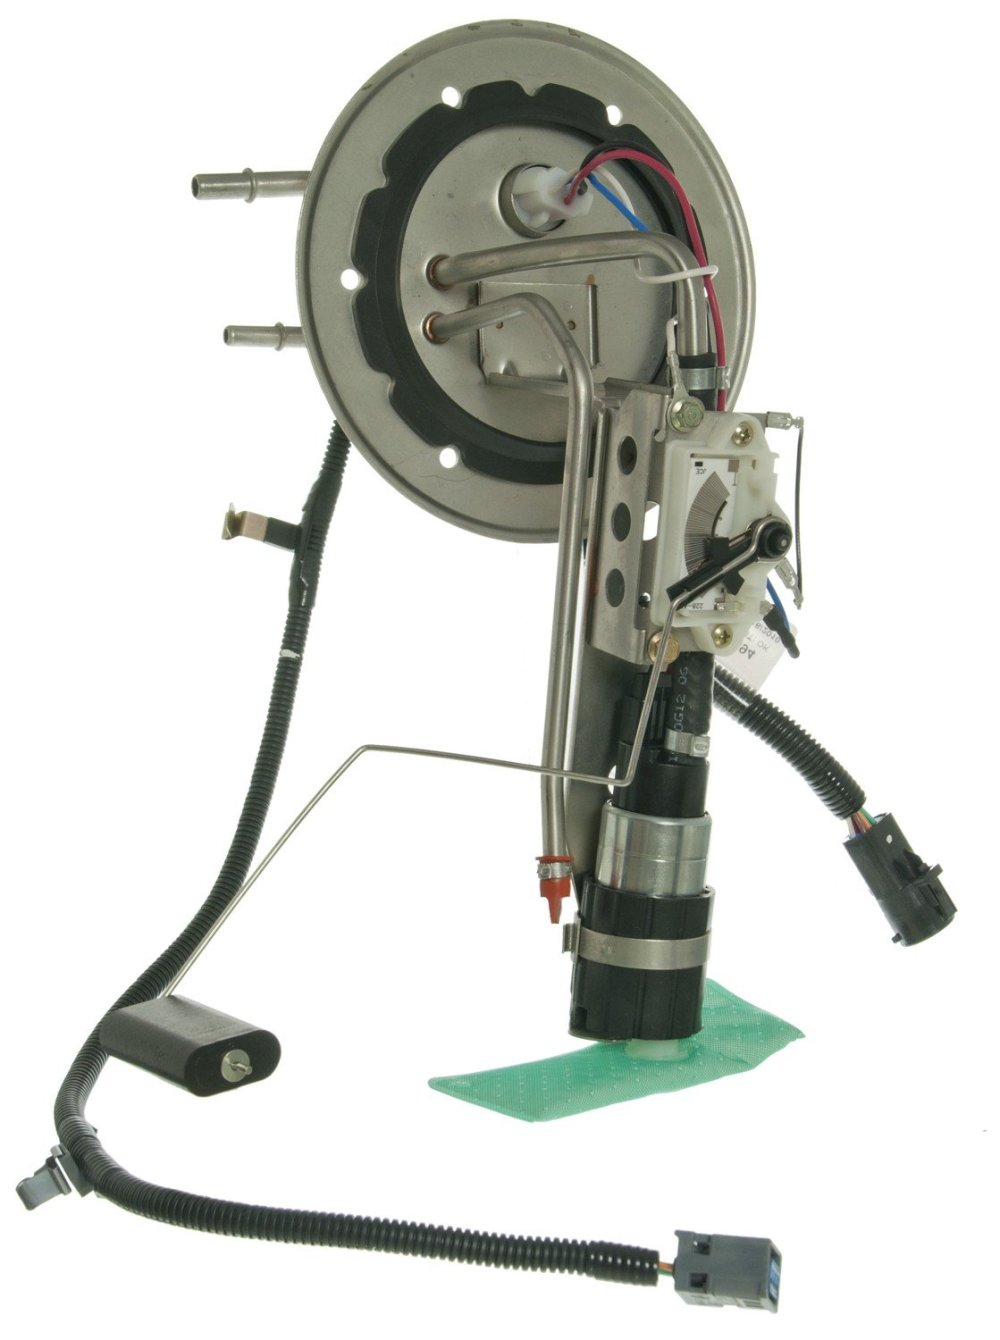 medium resolution of 2001 mercury grand marquis fuel pump hanger assembly 5c p76113s